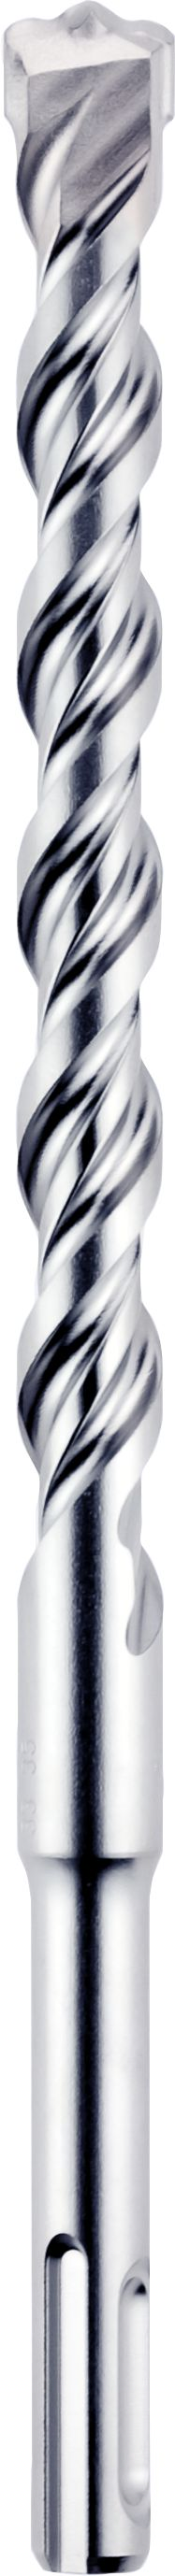 Slika BORER Rocket 3 SDS-plus 10x160 mm